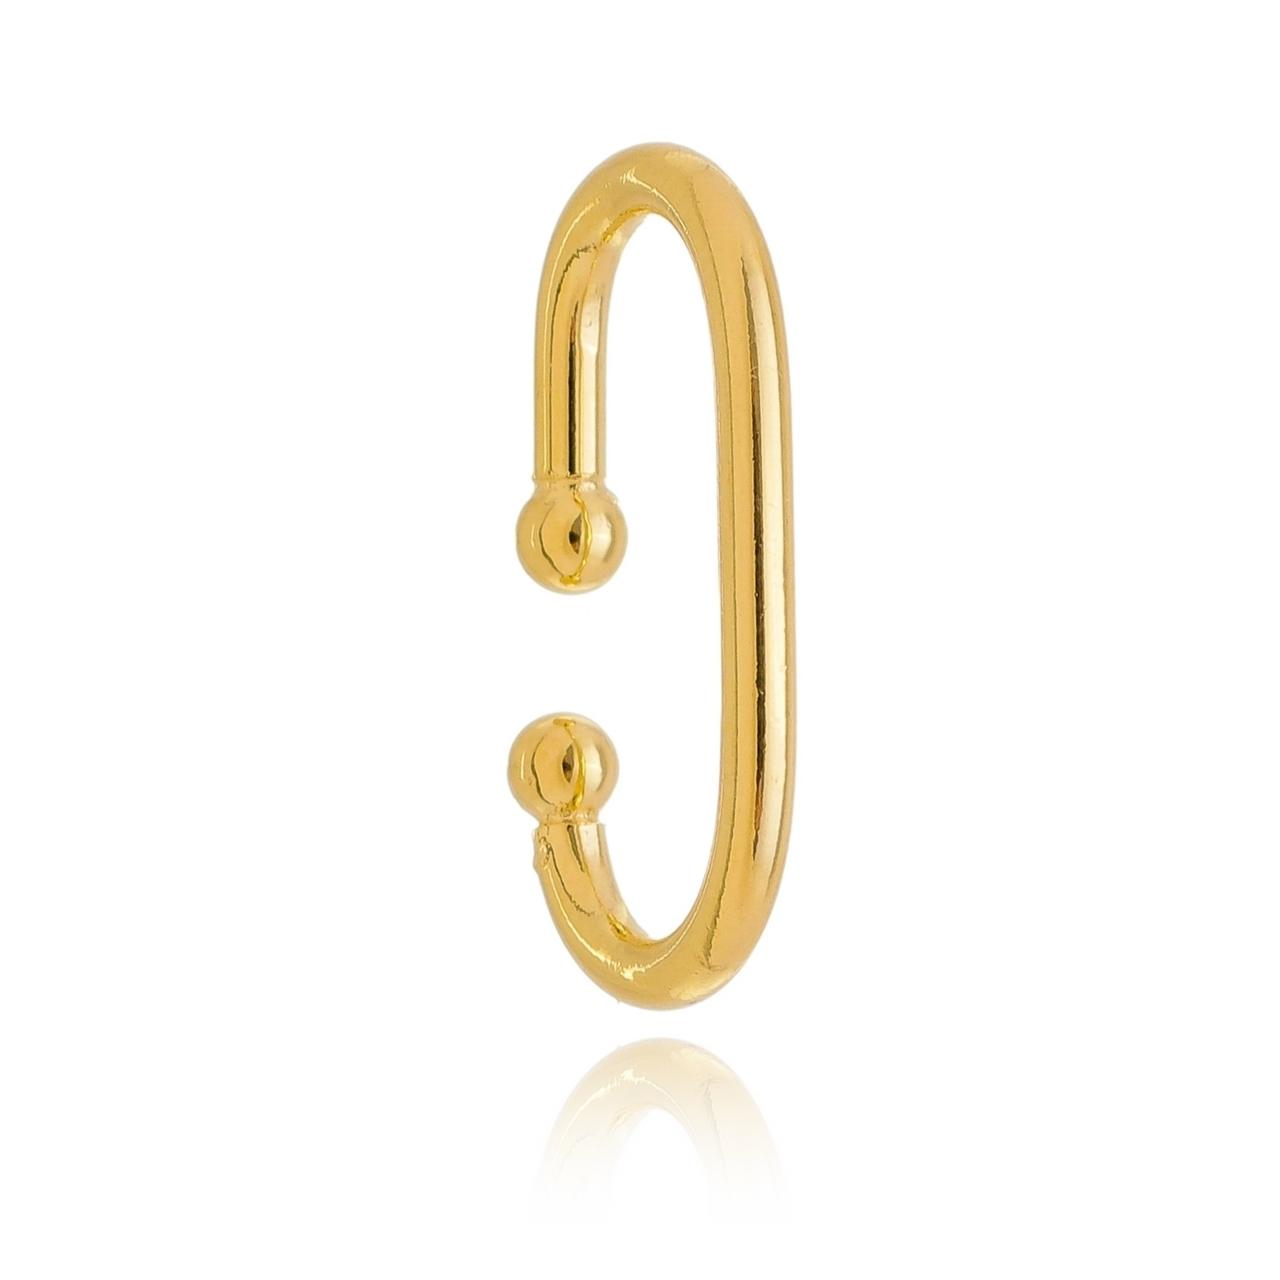 Piercing Ear Hook Liso Banhado em Ouro 18K